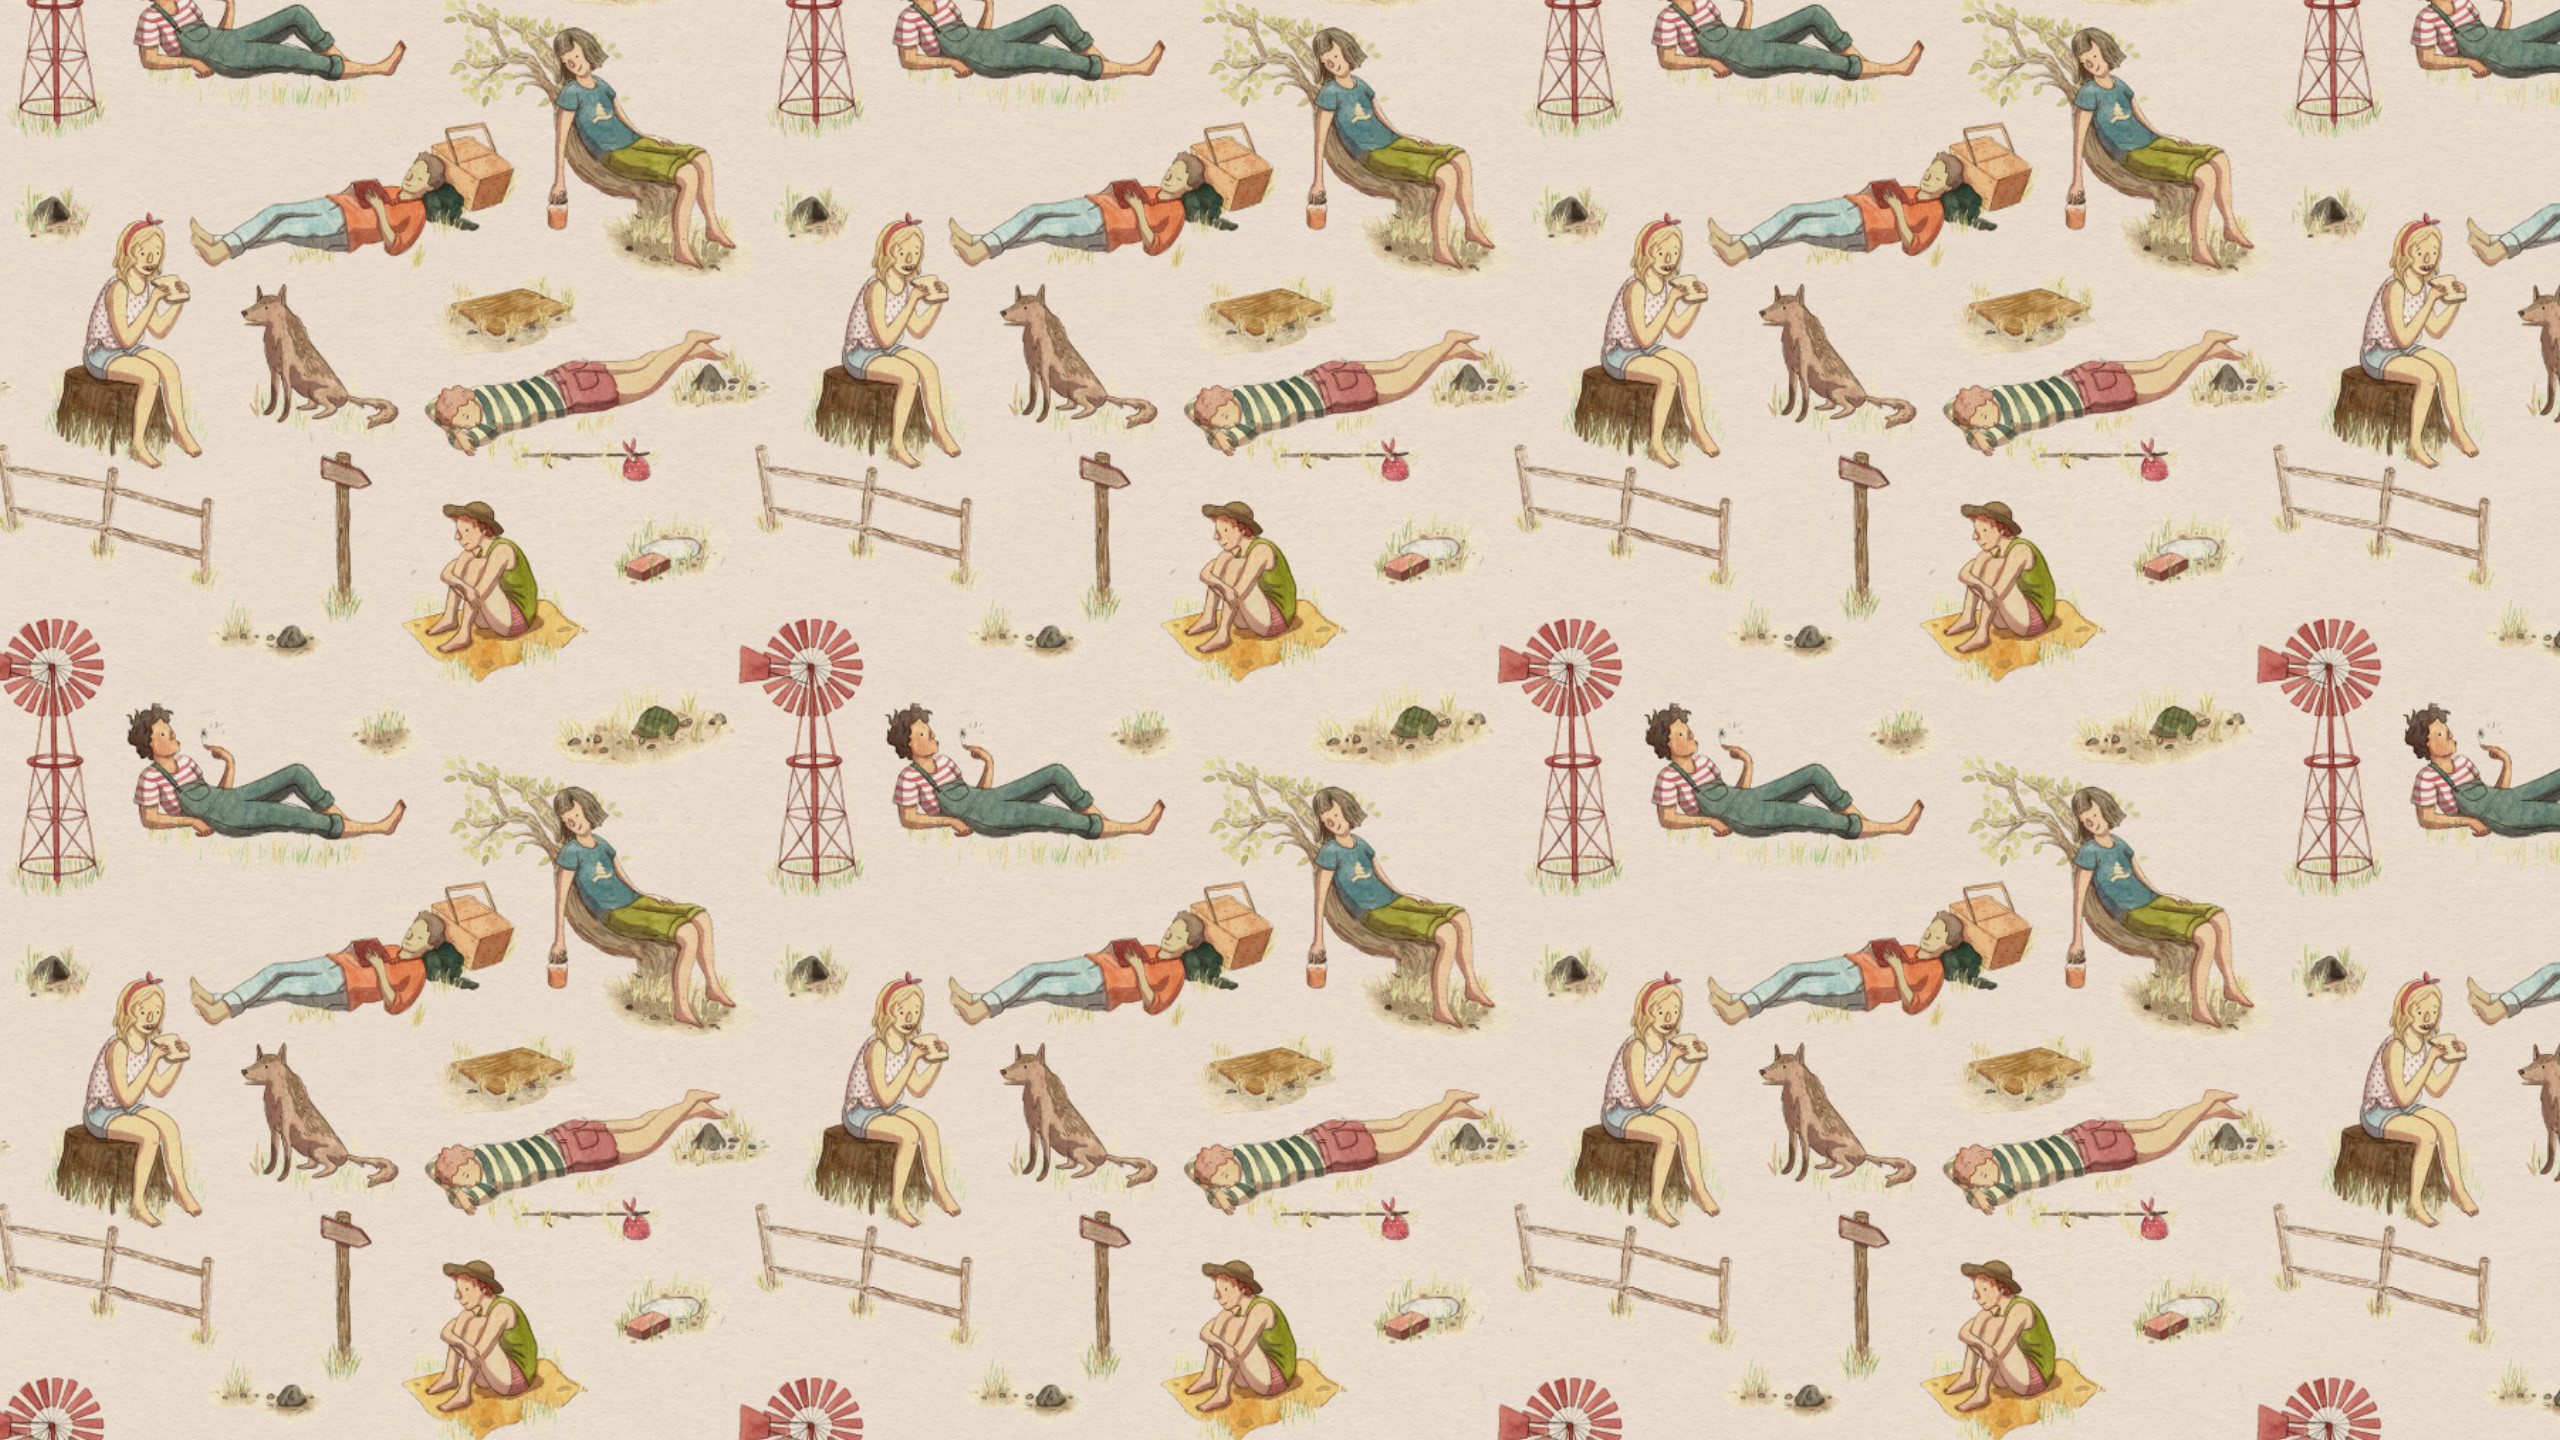 Artsy Desktop Backgrounds 183 ① Wallpapertag